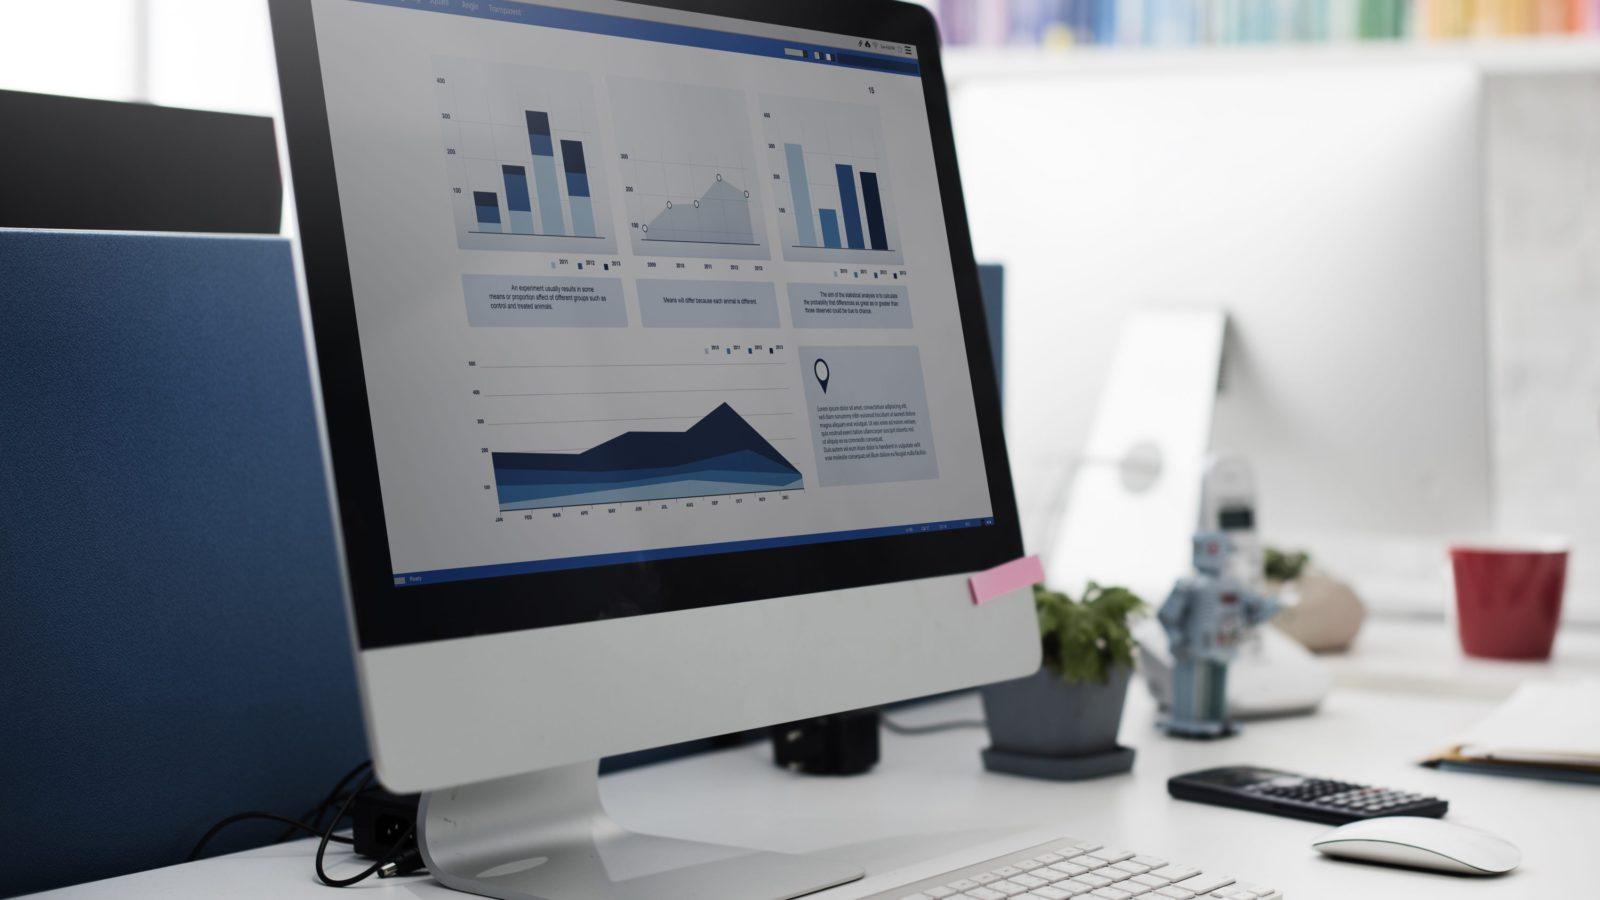 mac displaying analytics data for website monetization efforts